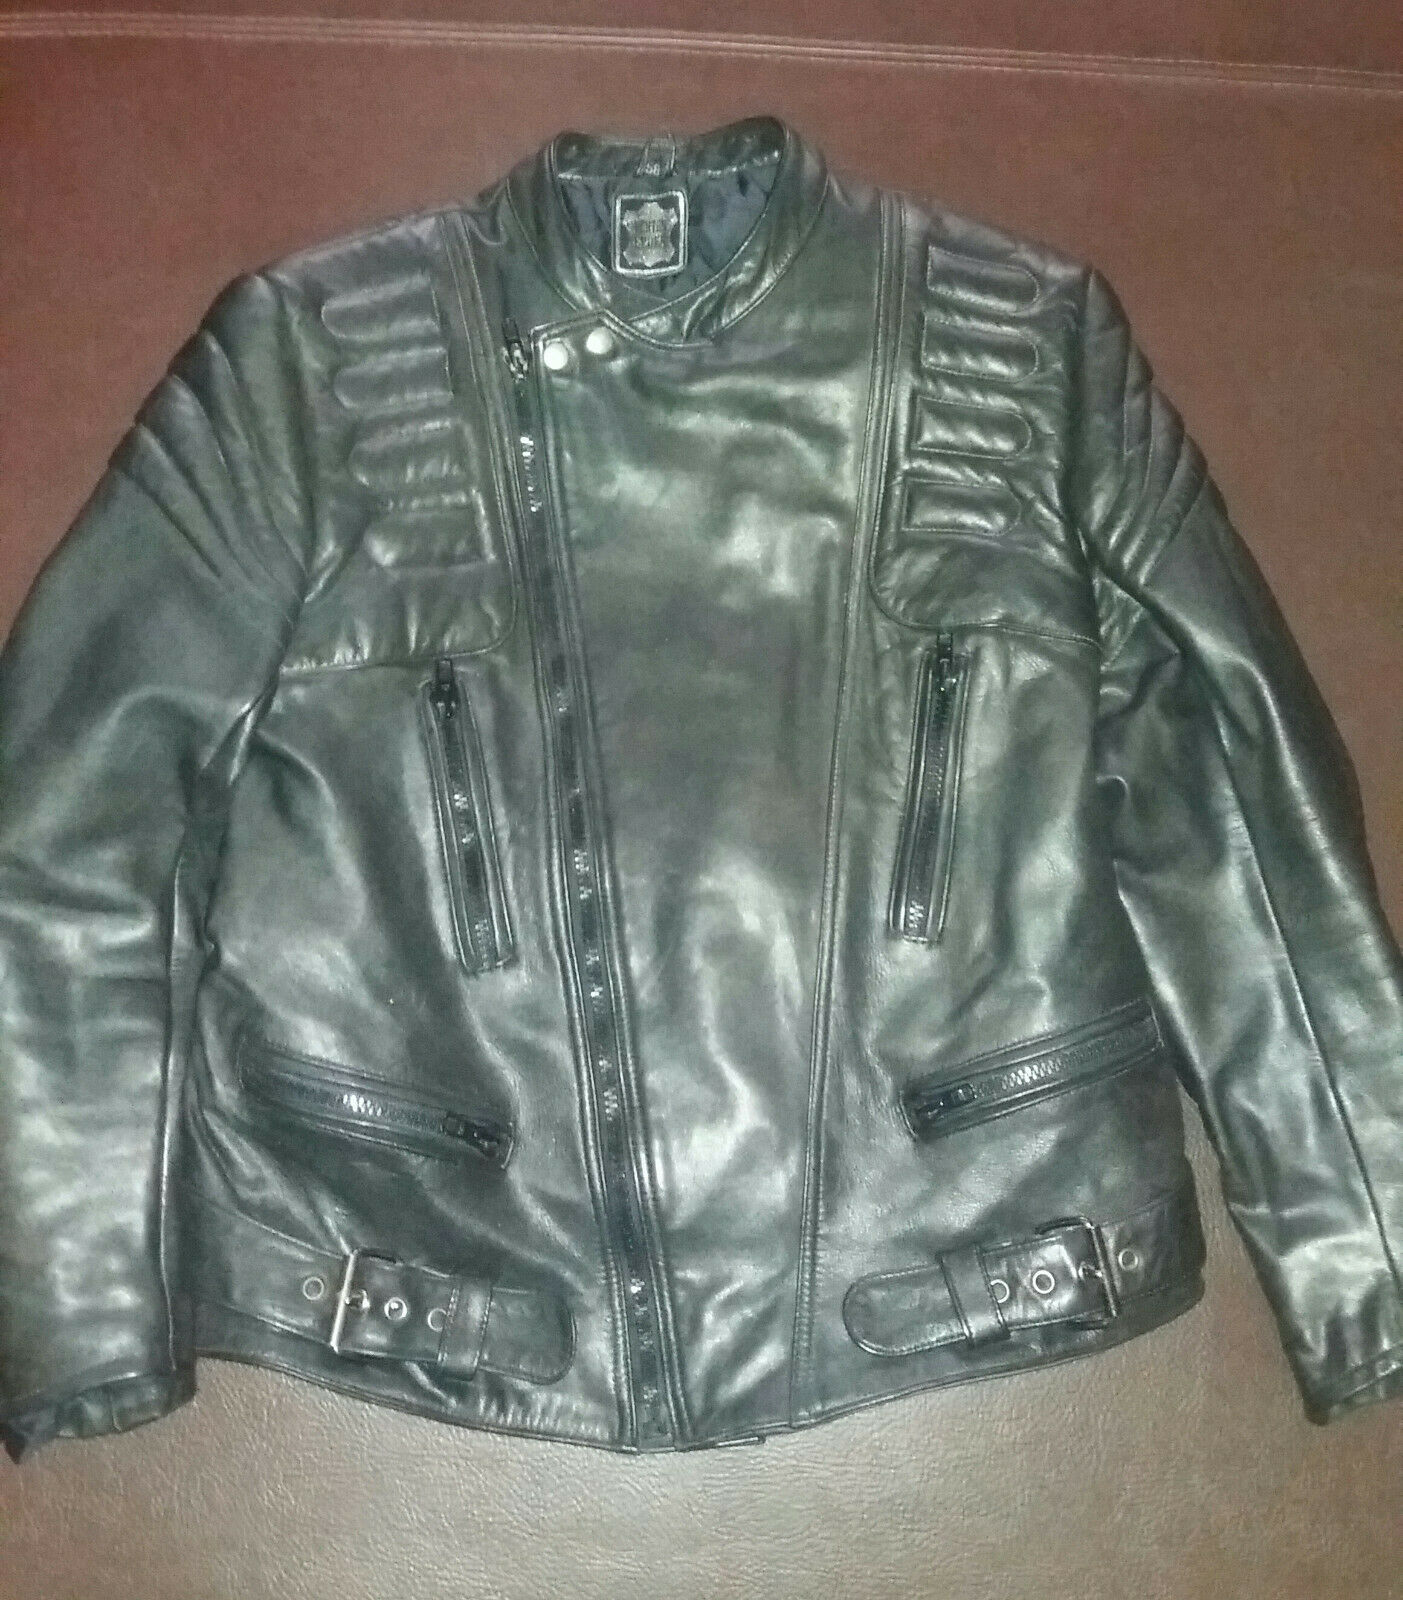 M Schwarz Textil Sommer Jacke 6533 Motorrad Jacke Held Tropic II Gr